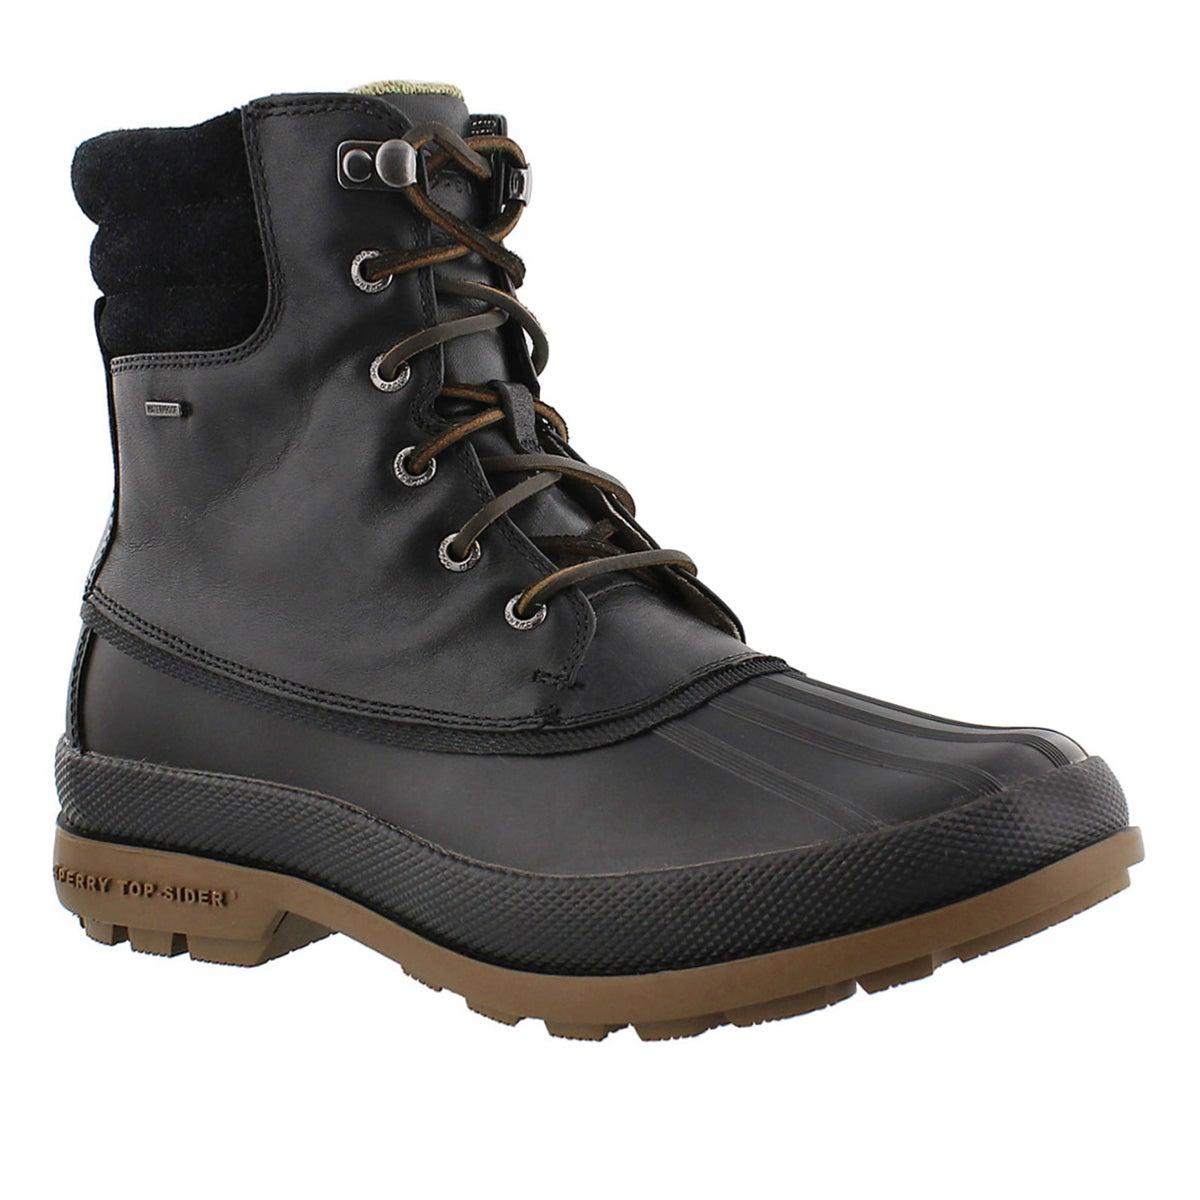 Mns Cold Bay black boot